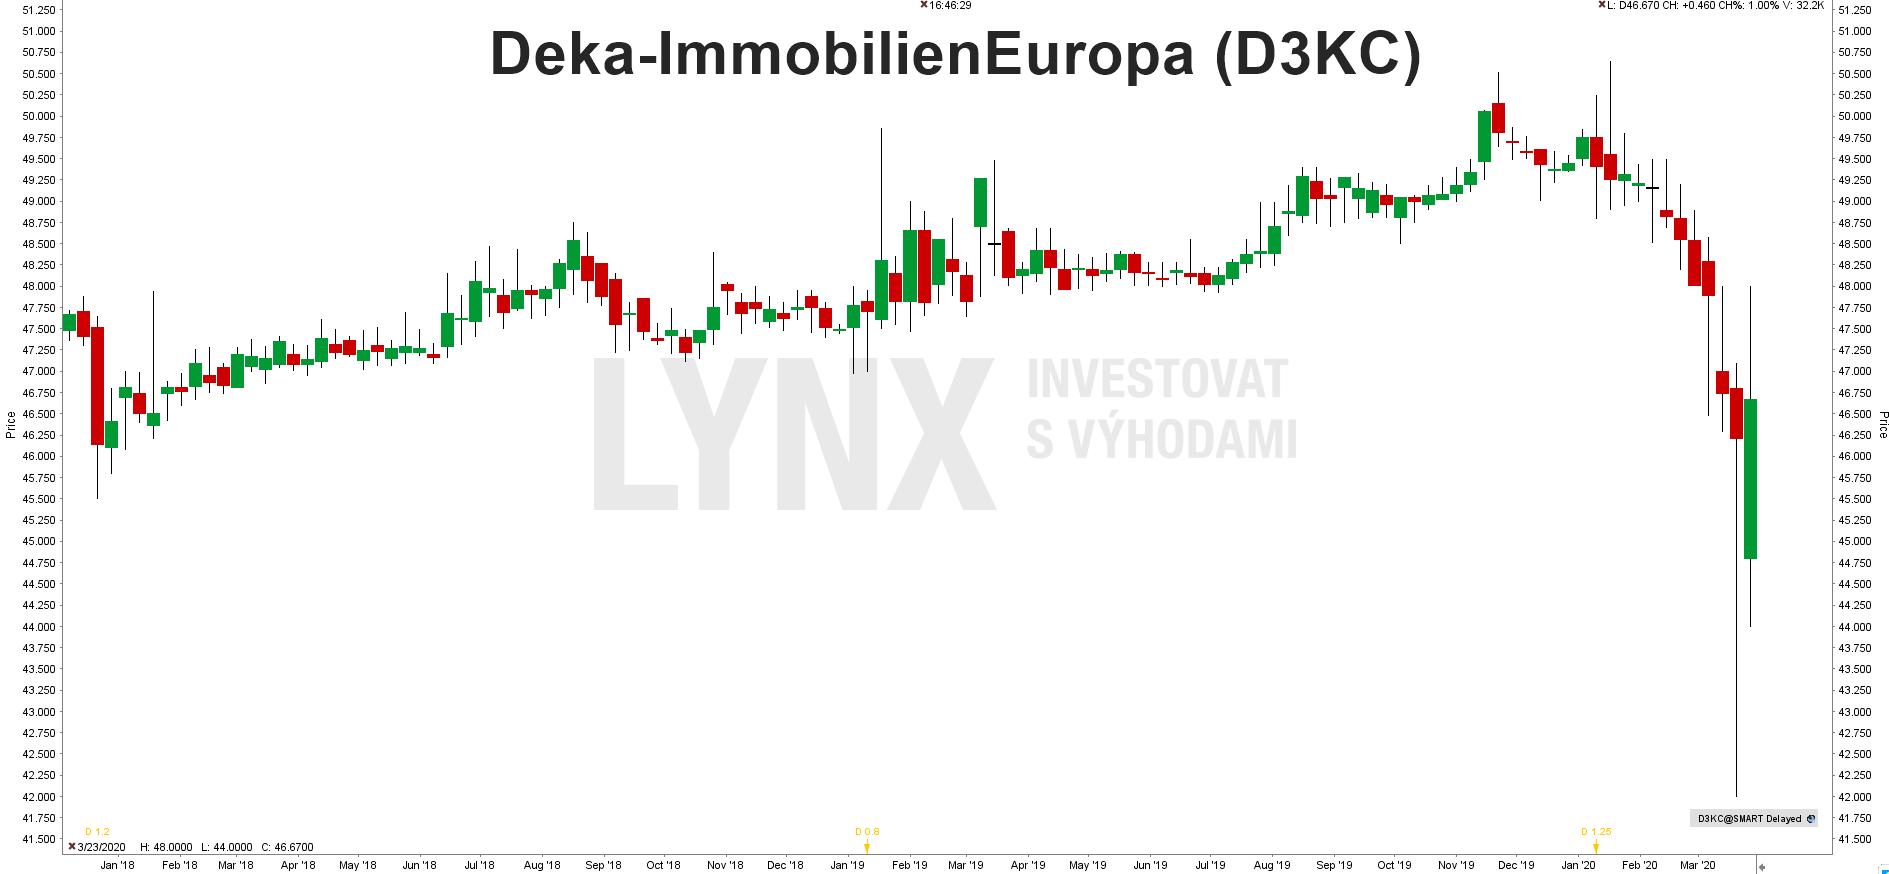 Graf fondu Deka-Immobilien Europa